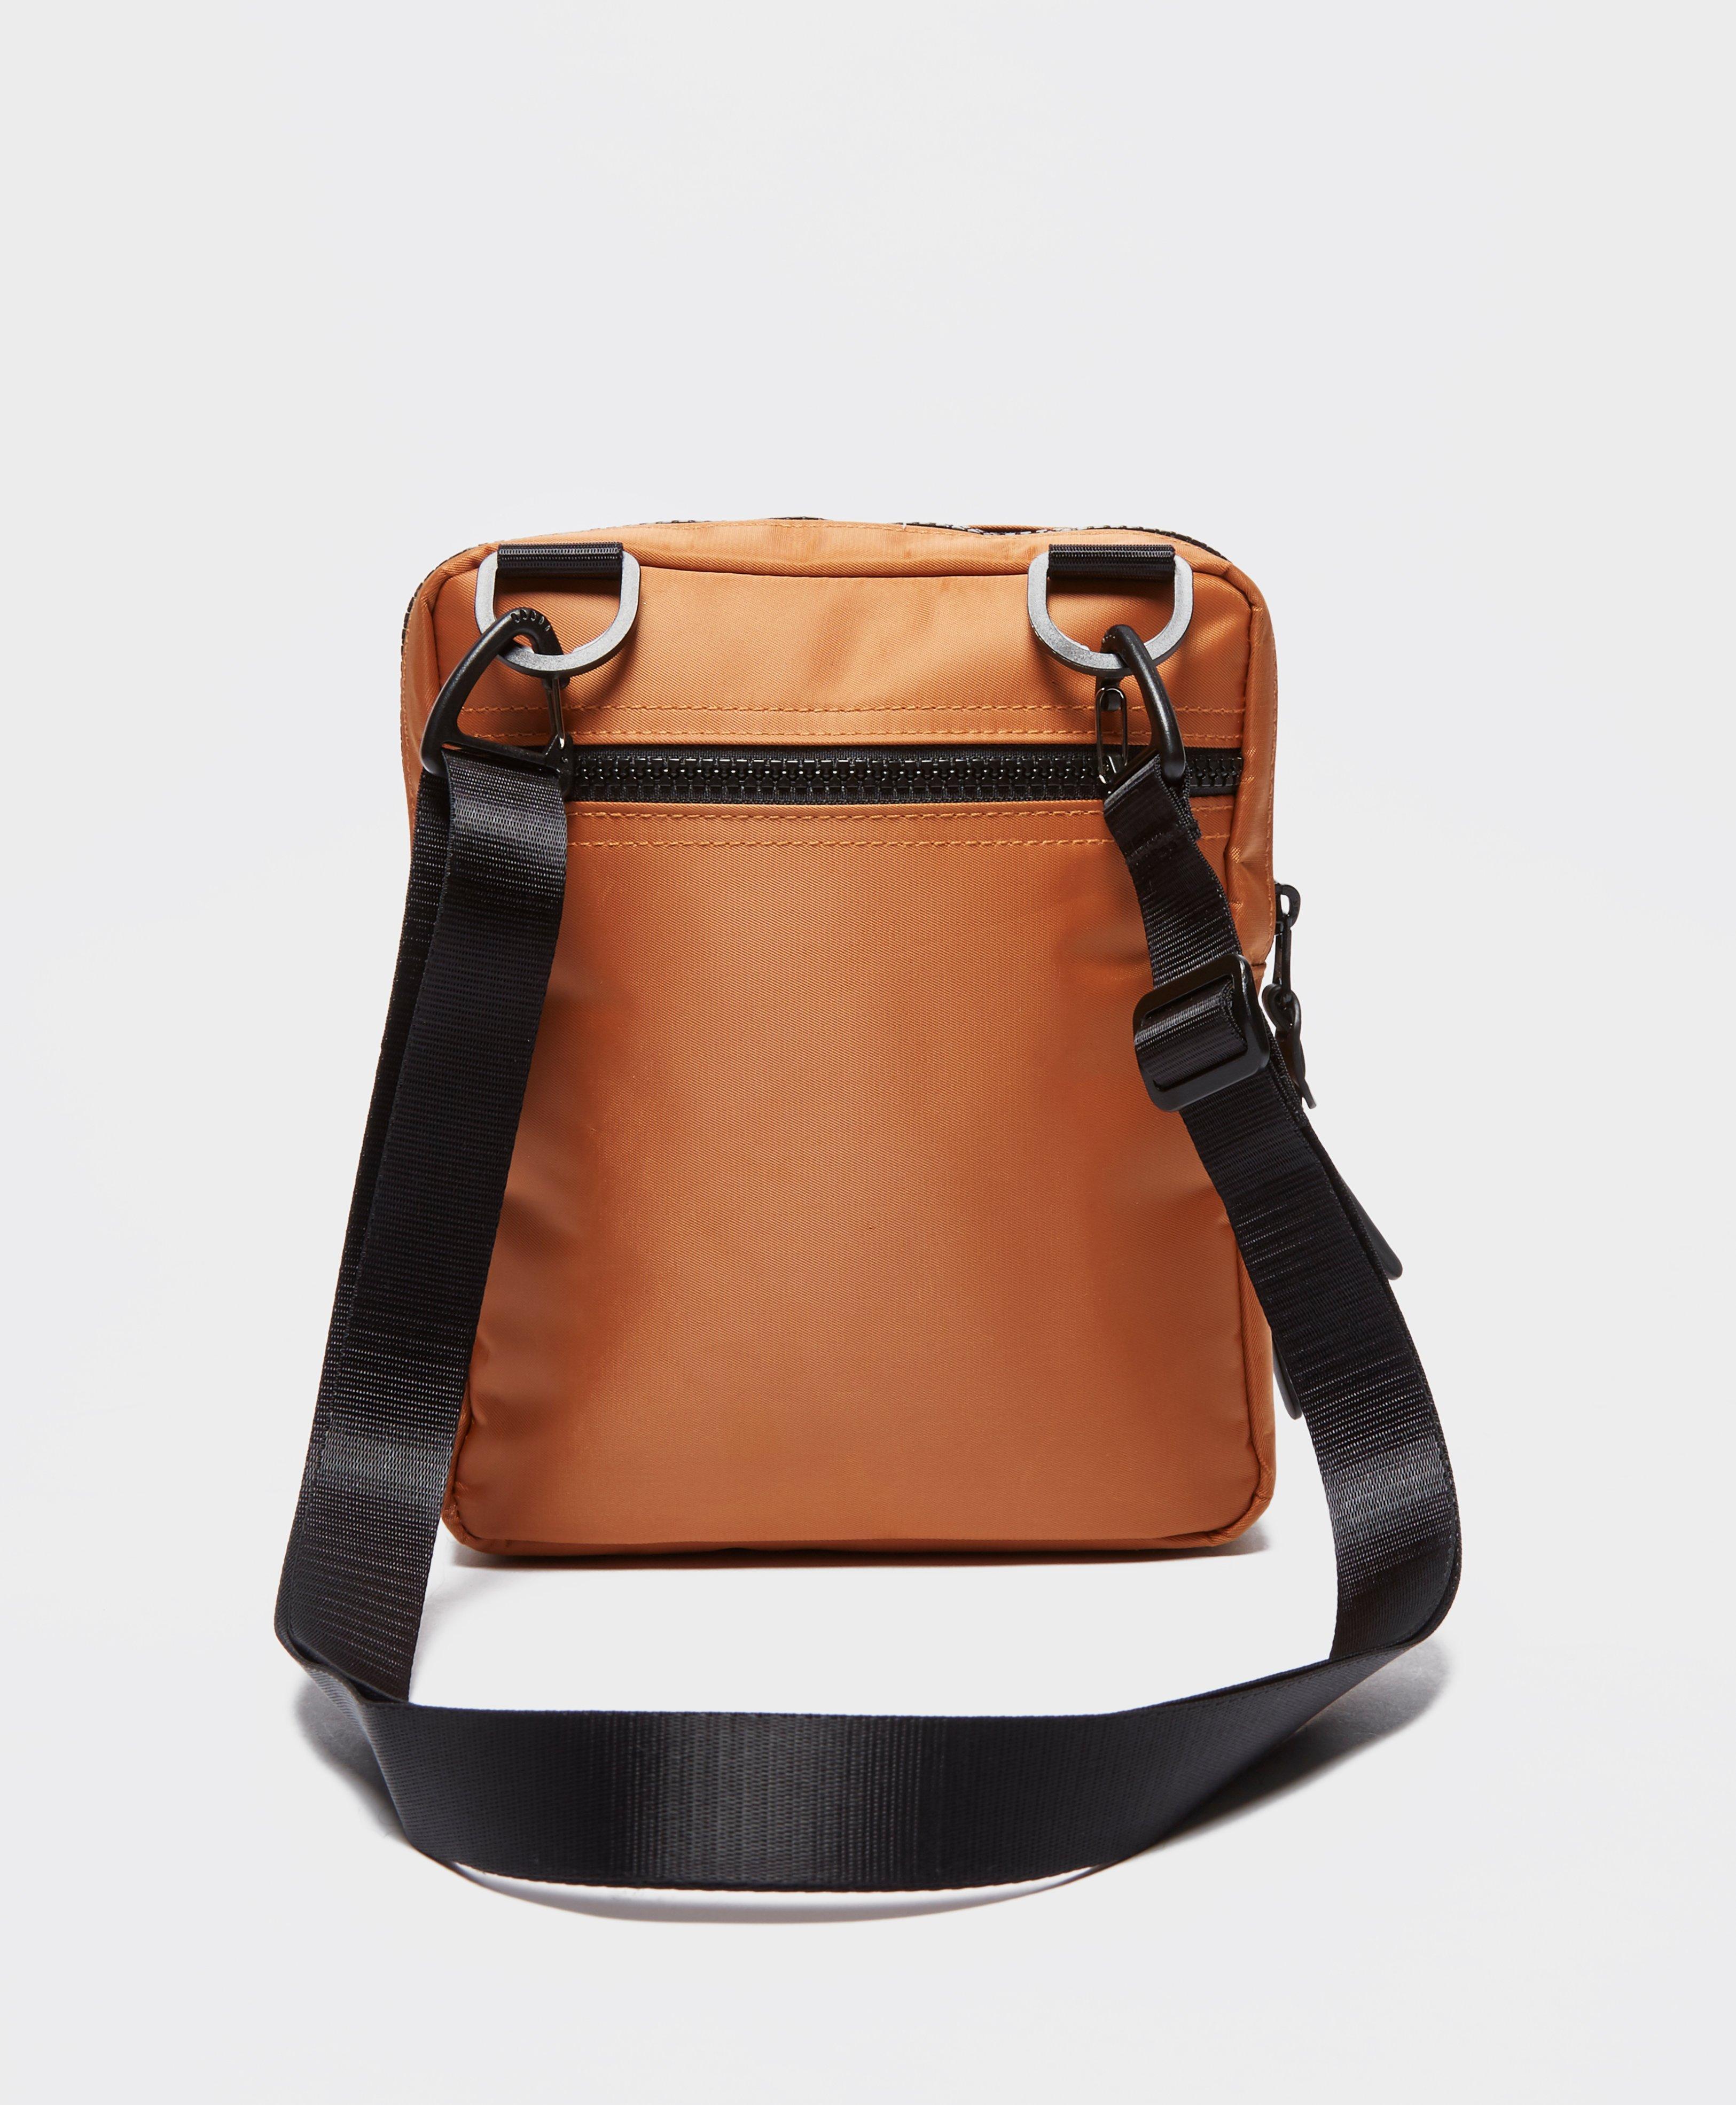 Lyst Fila Side Bag For Men Ready Stock Waist Zipper On Multicolor View Fullscreen